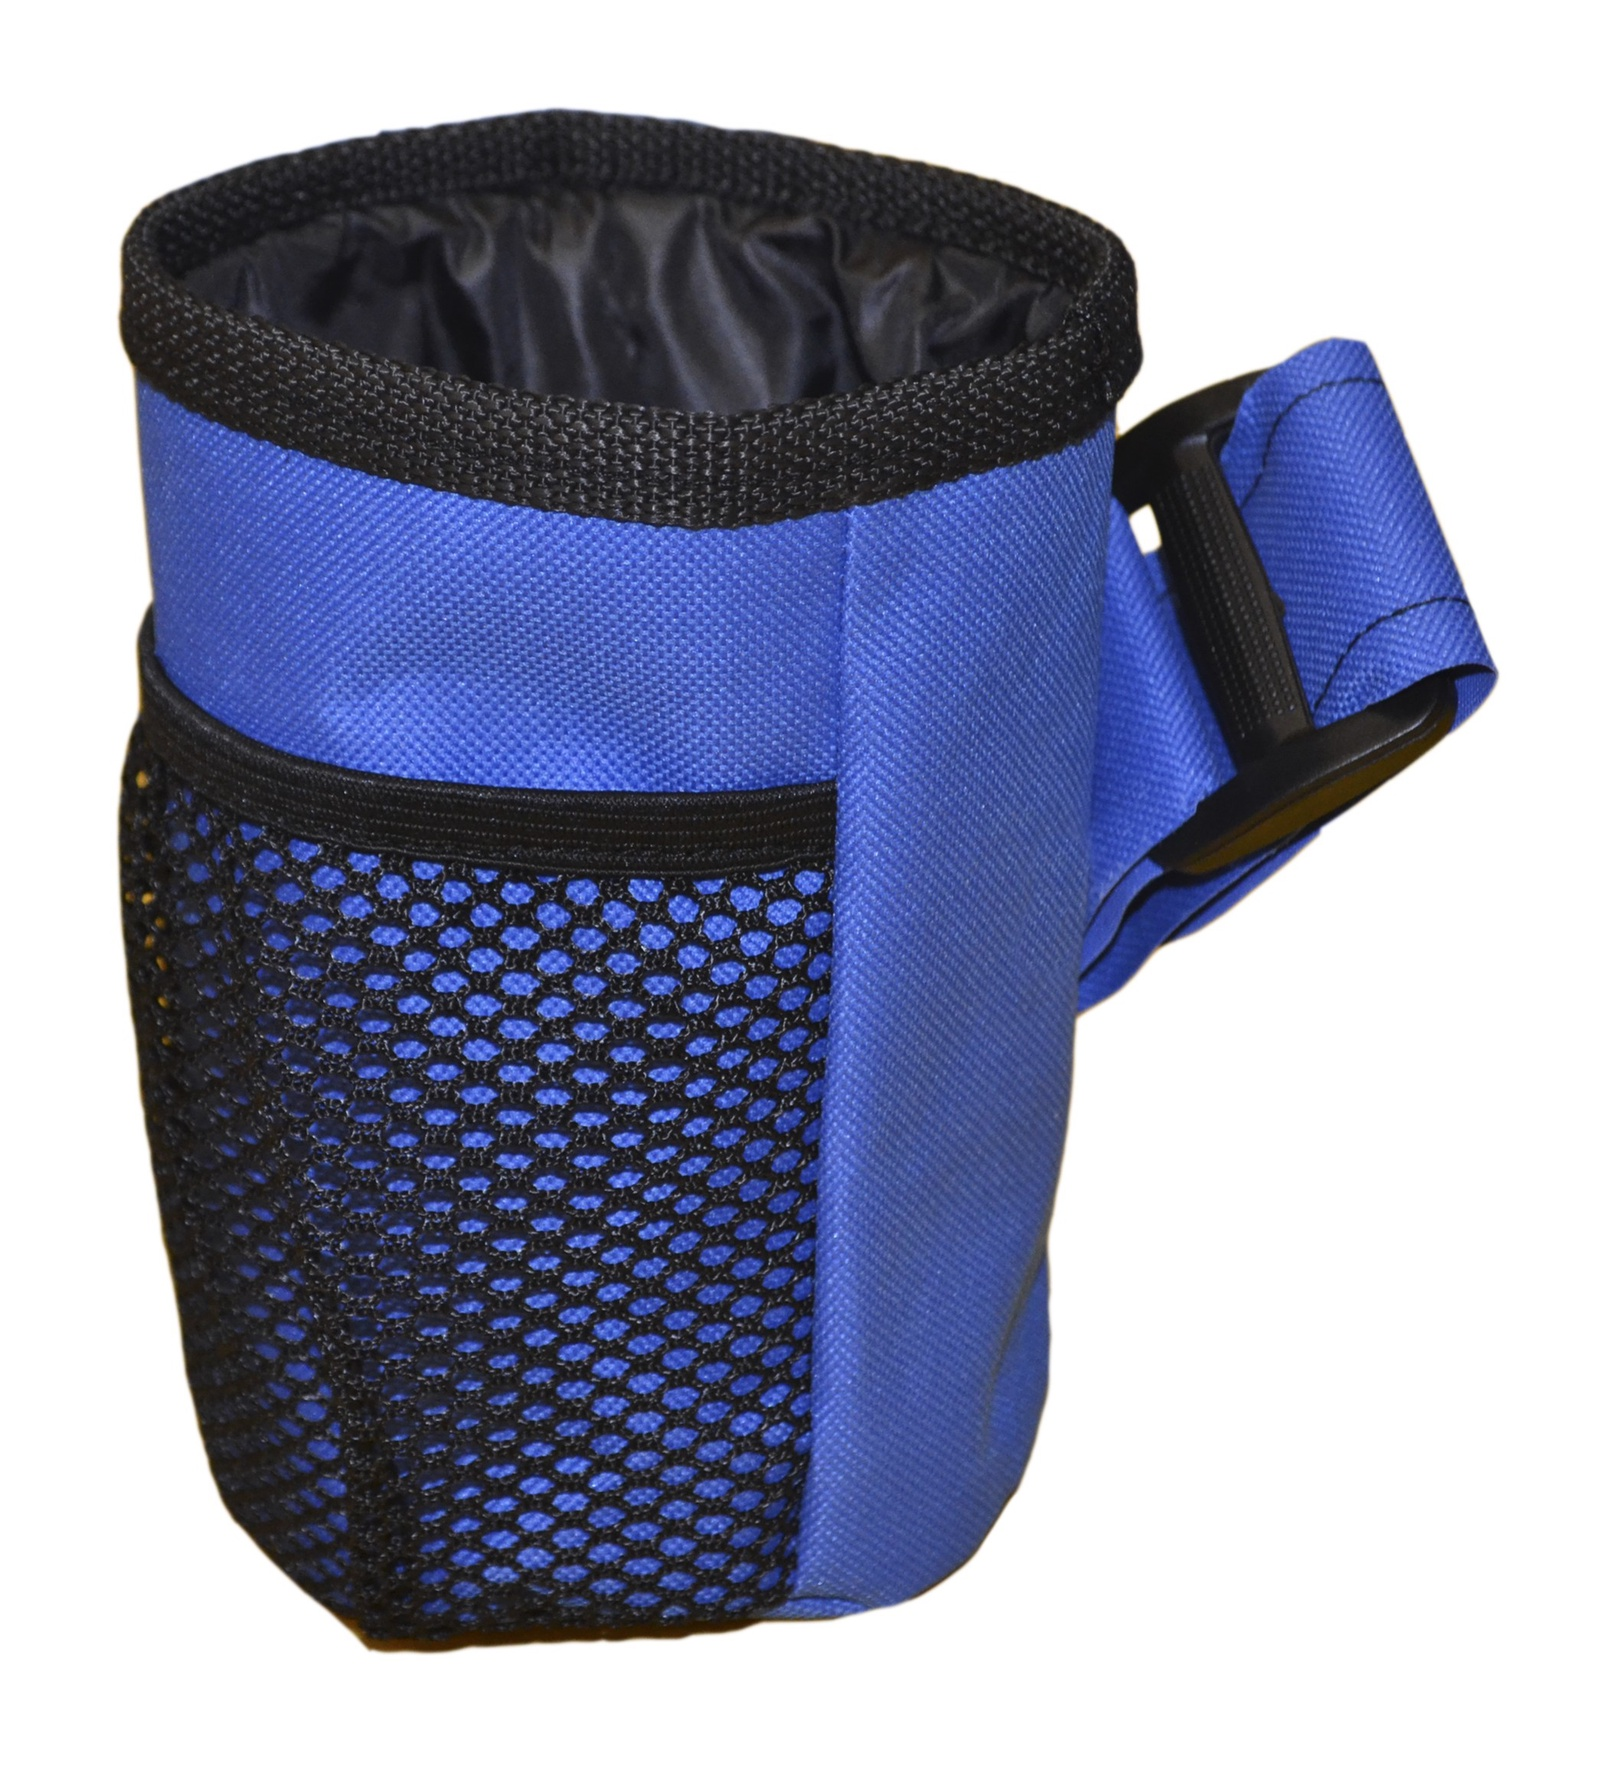 Аксессуар для колясок Мирти Сумка-бутылочница на креплении для коляски